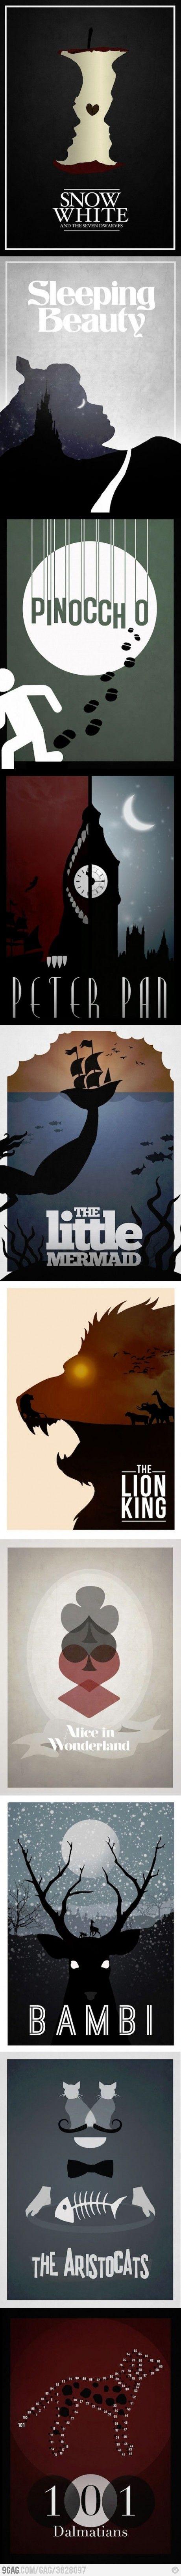 Disney poster redesigns